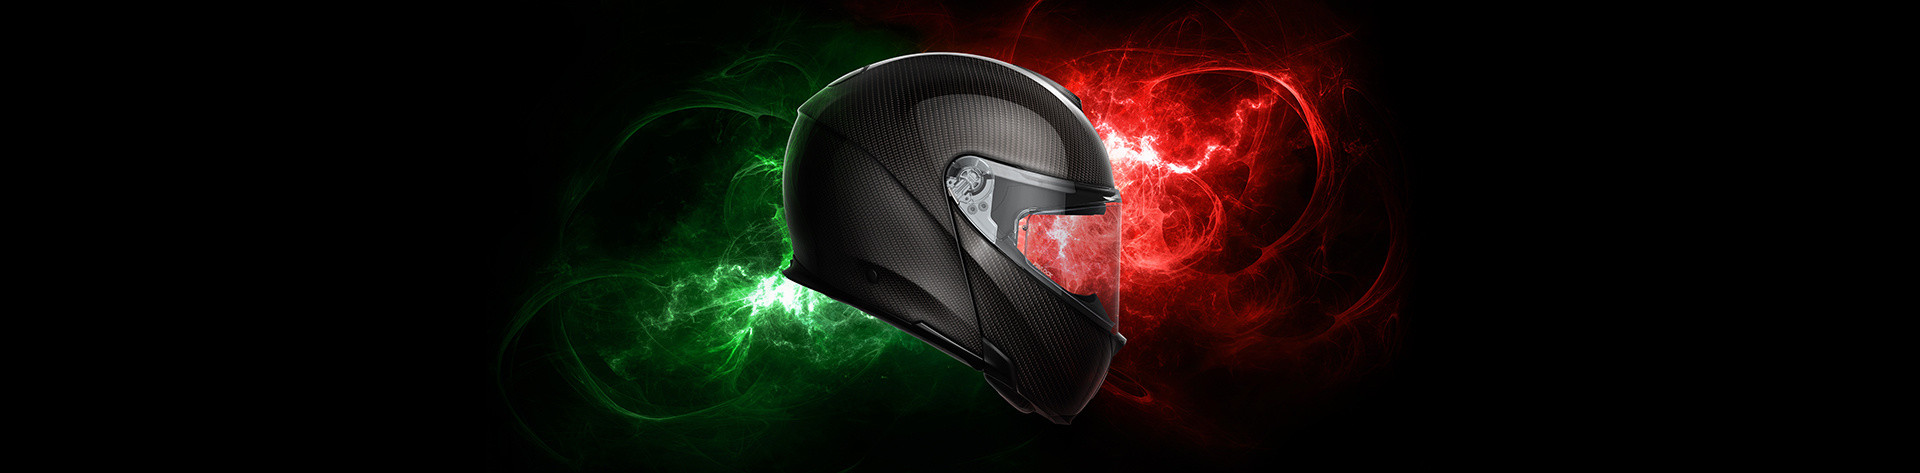 Modular Helmets Sportmodular Agv Motorcycle Helmets Official Website